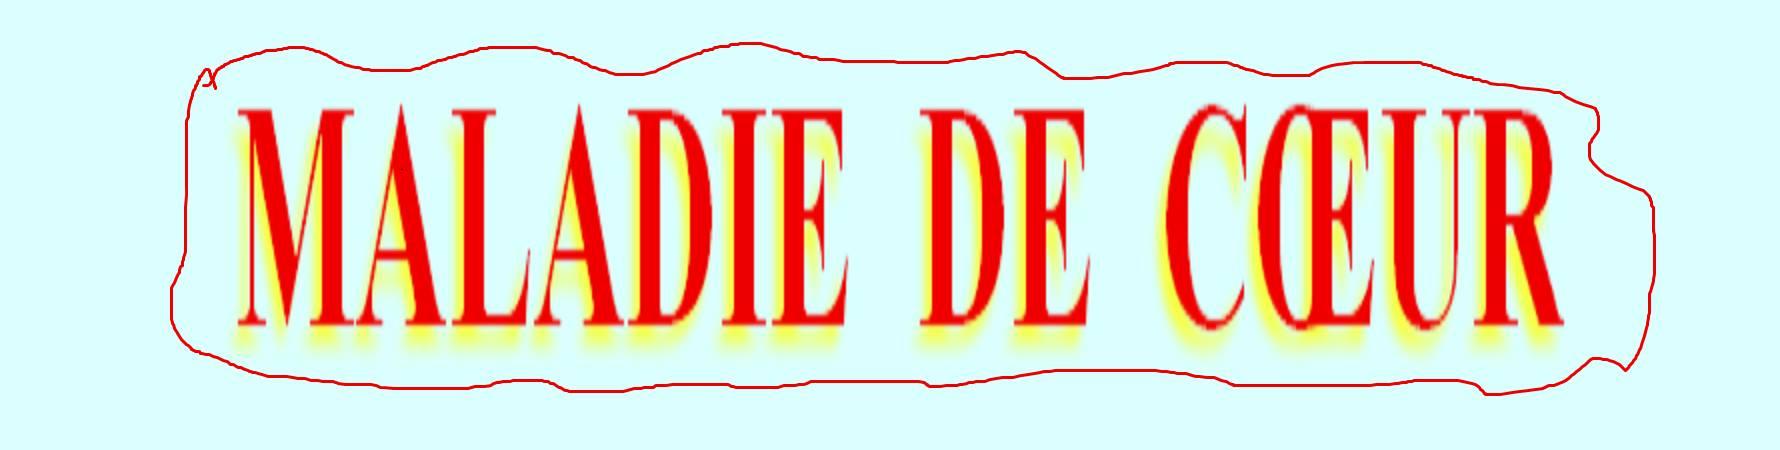 201218703_1121271635029532_1325598398175120867_n